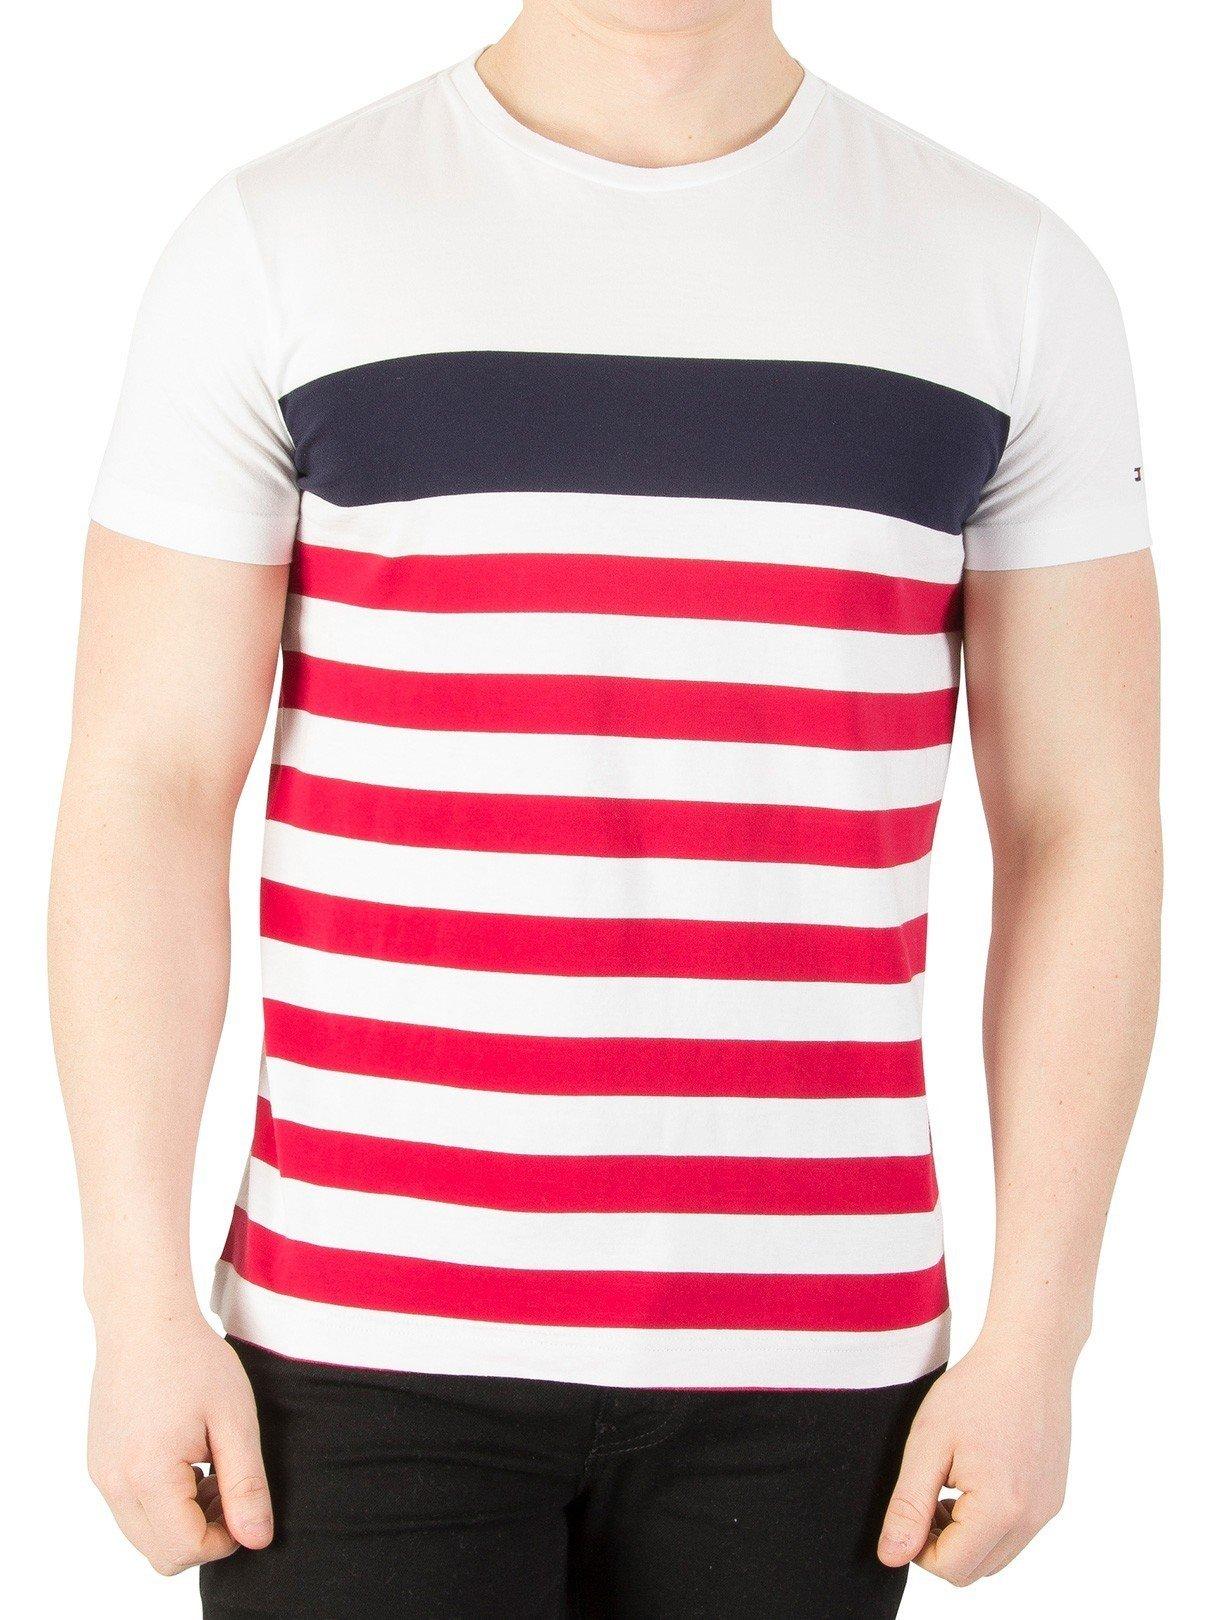 Tommy Hilfiger NAS STP C-nk tee S/S RF Camiseta para Hombre